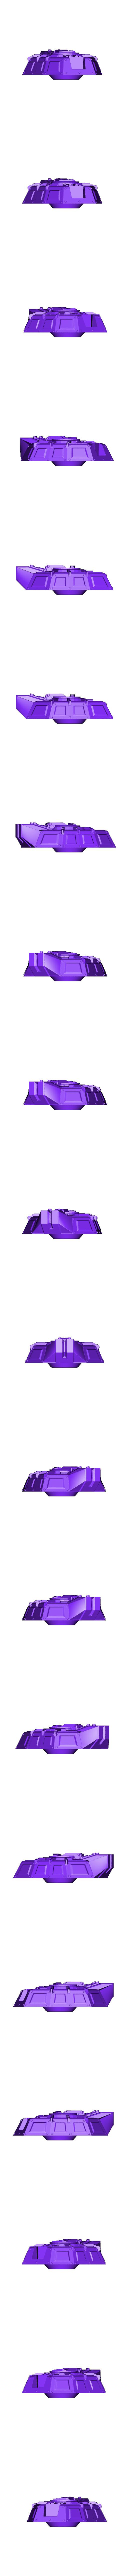 Turret.stl Download STL file ARMED BUNKERS • 3D printer template, Txarli_Factory